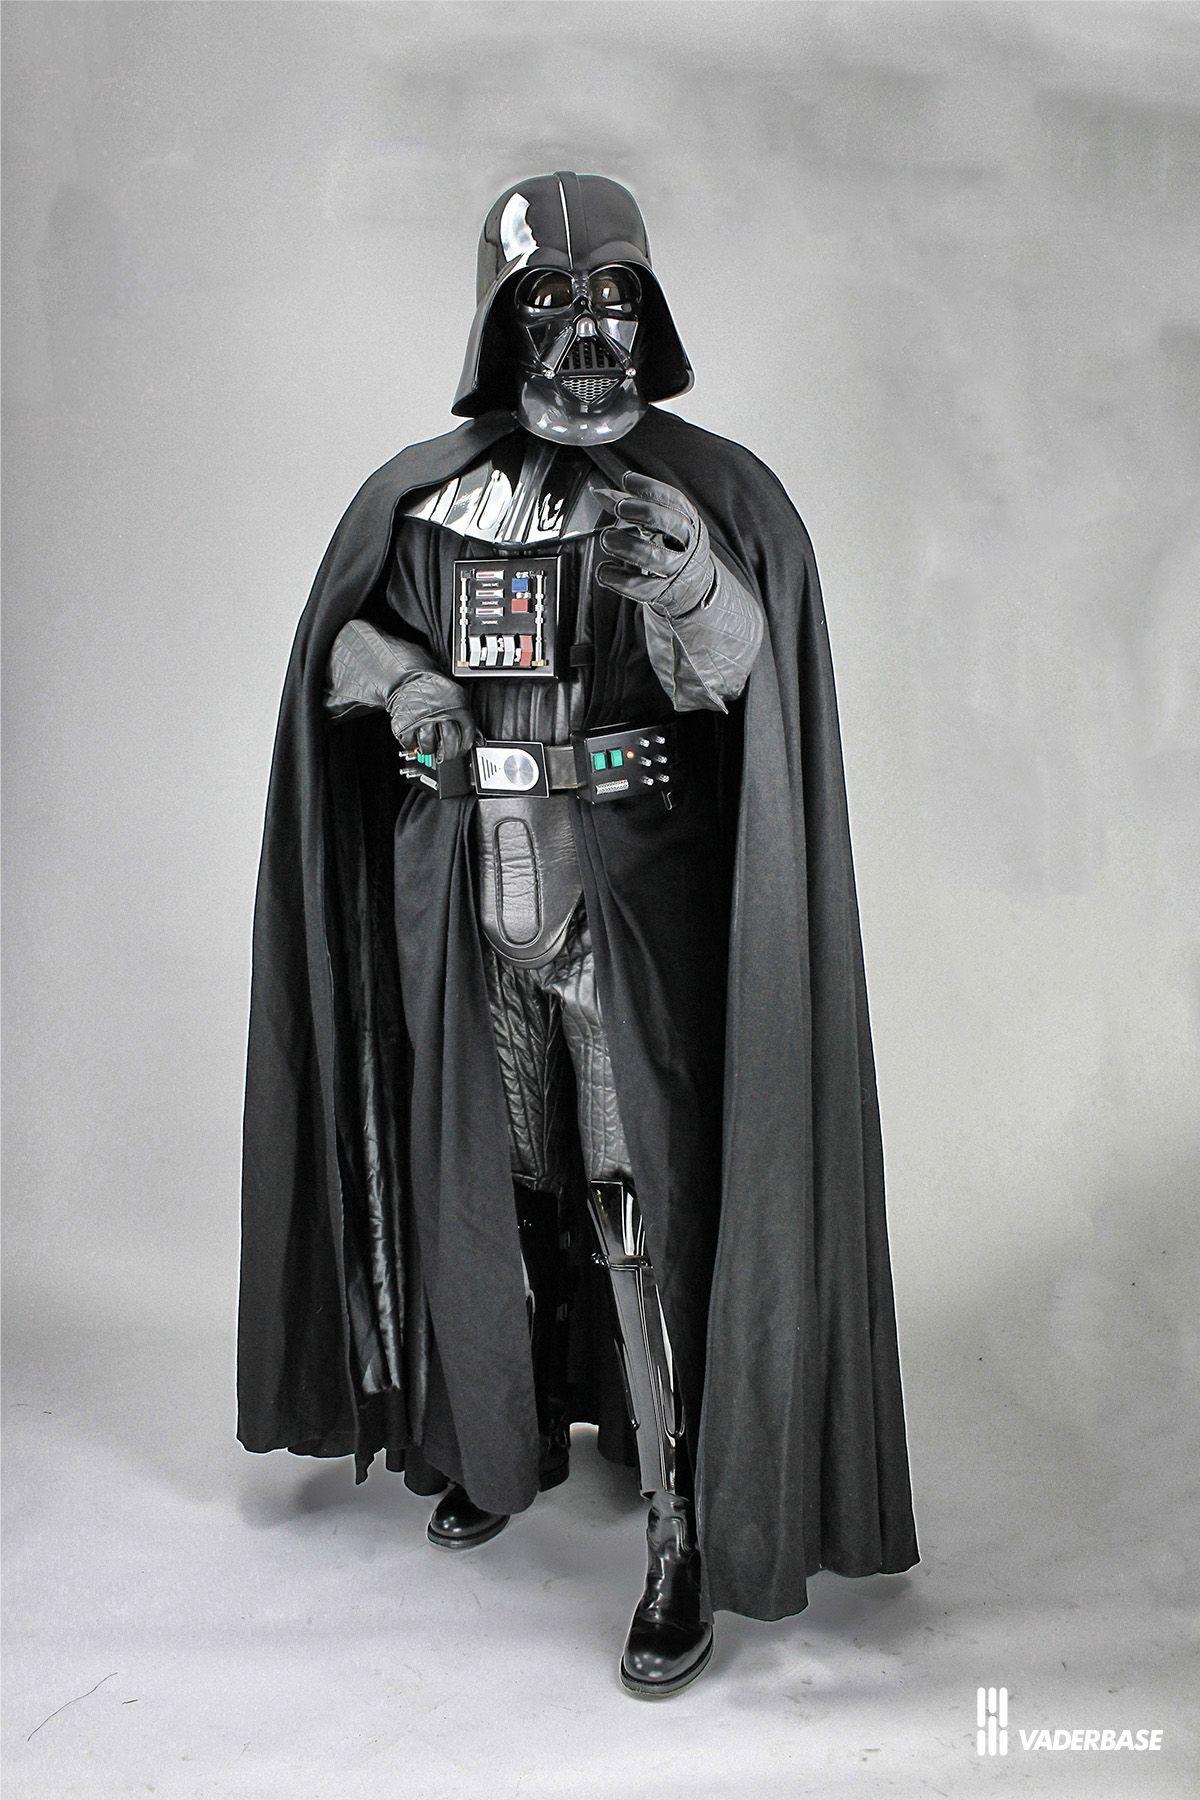 This Is Vaderbase Darth Vader Suit Up No Rubies Supreme Esb Episode V Empire Strikes Back Quasimodo Darksid Star Wars Images Star Wars Pictures Vader Star Wars